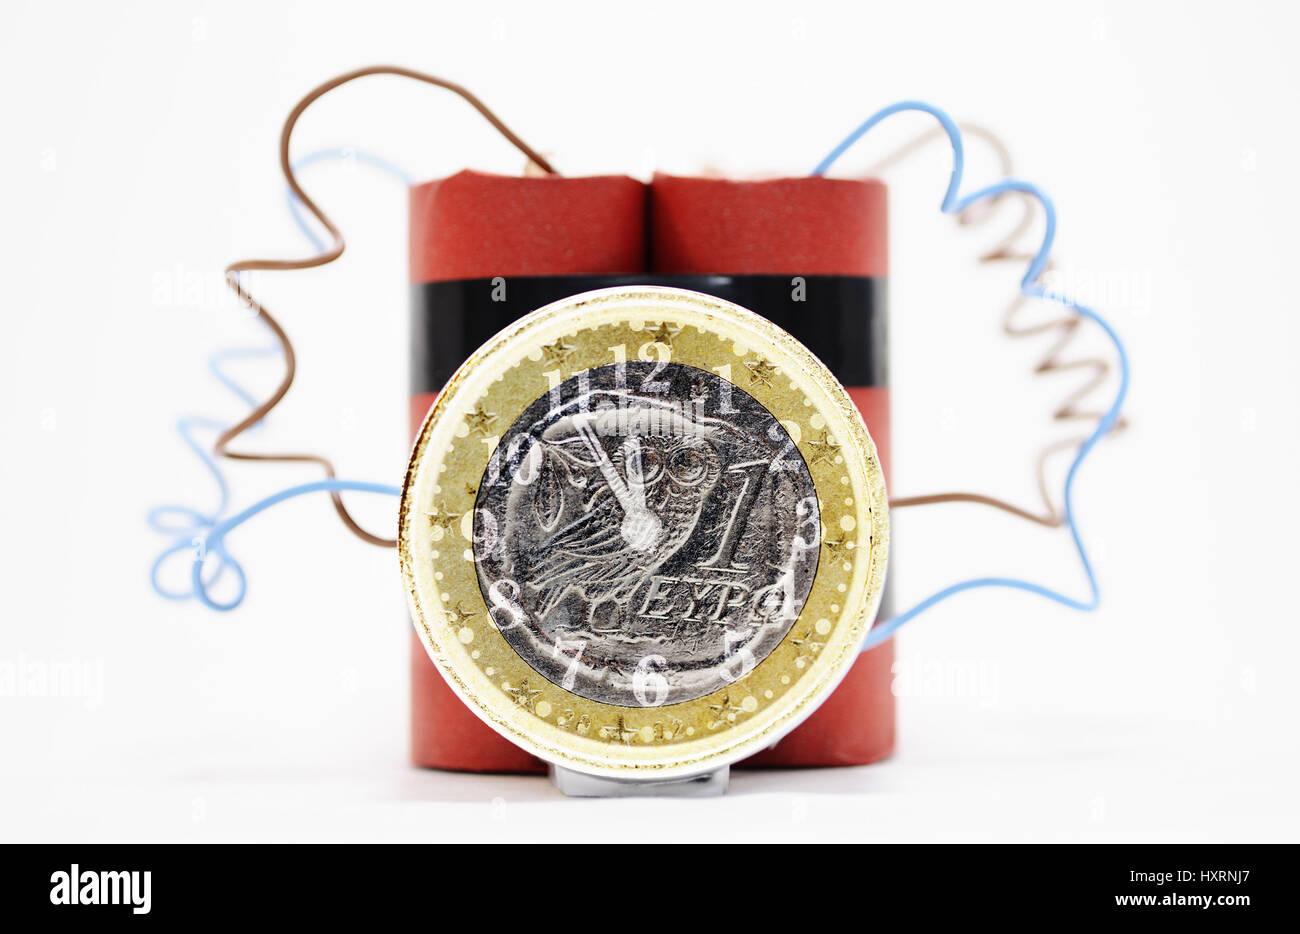 Time bomb with Greek euro, state deficit Greece, Zeitbombe mit griechischem Euro, Staatsdefizit Griechenland - Stock Image